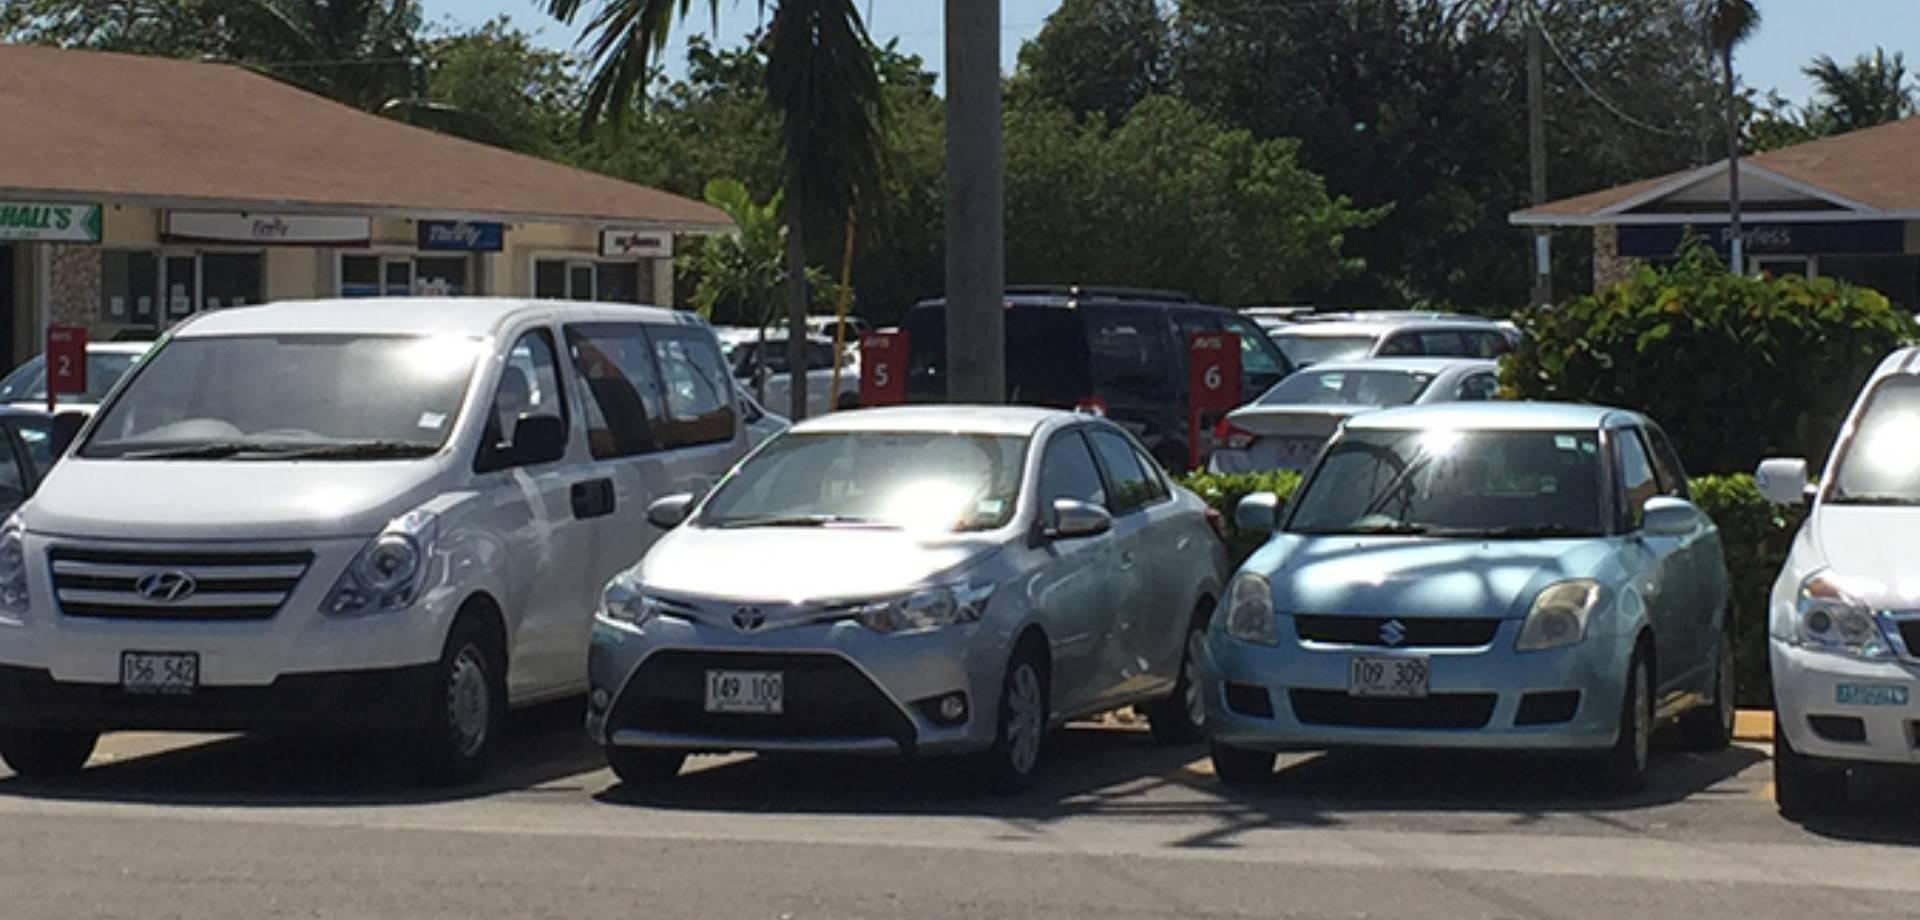 Car Rental Agencies